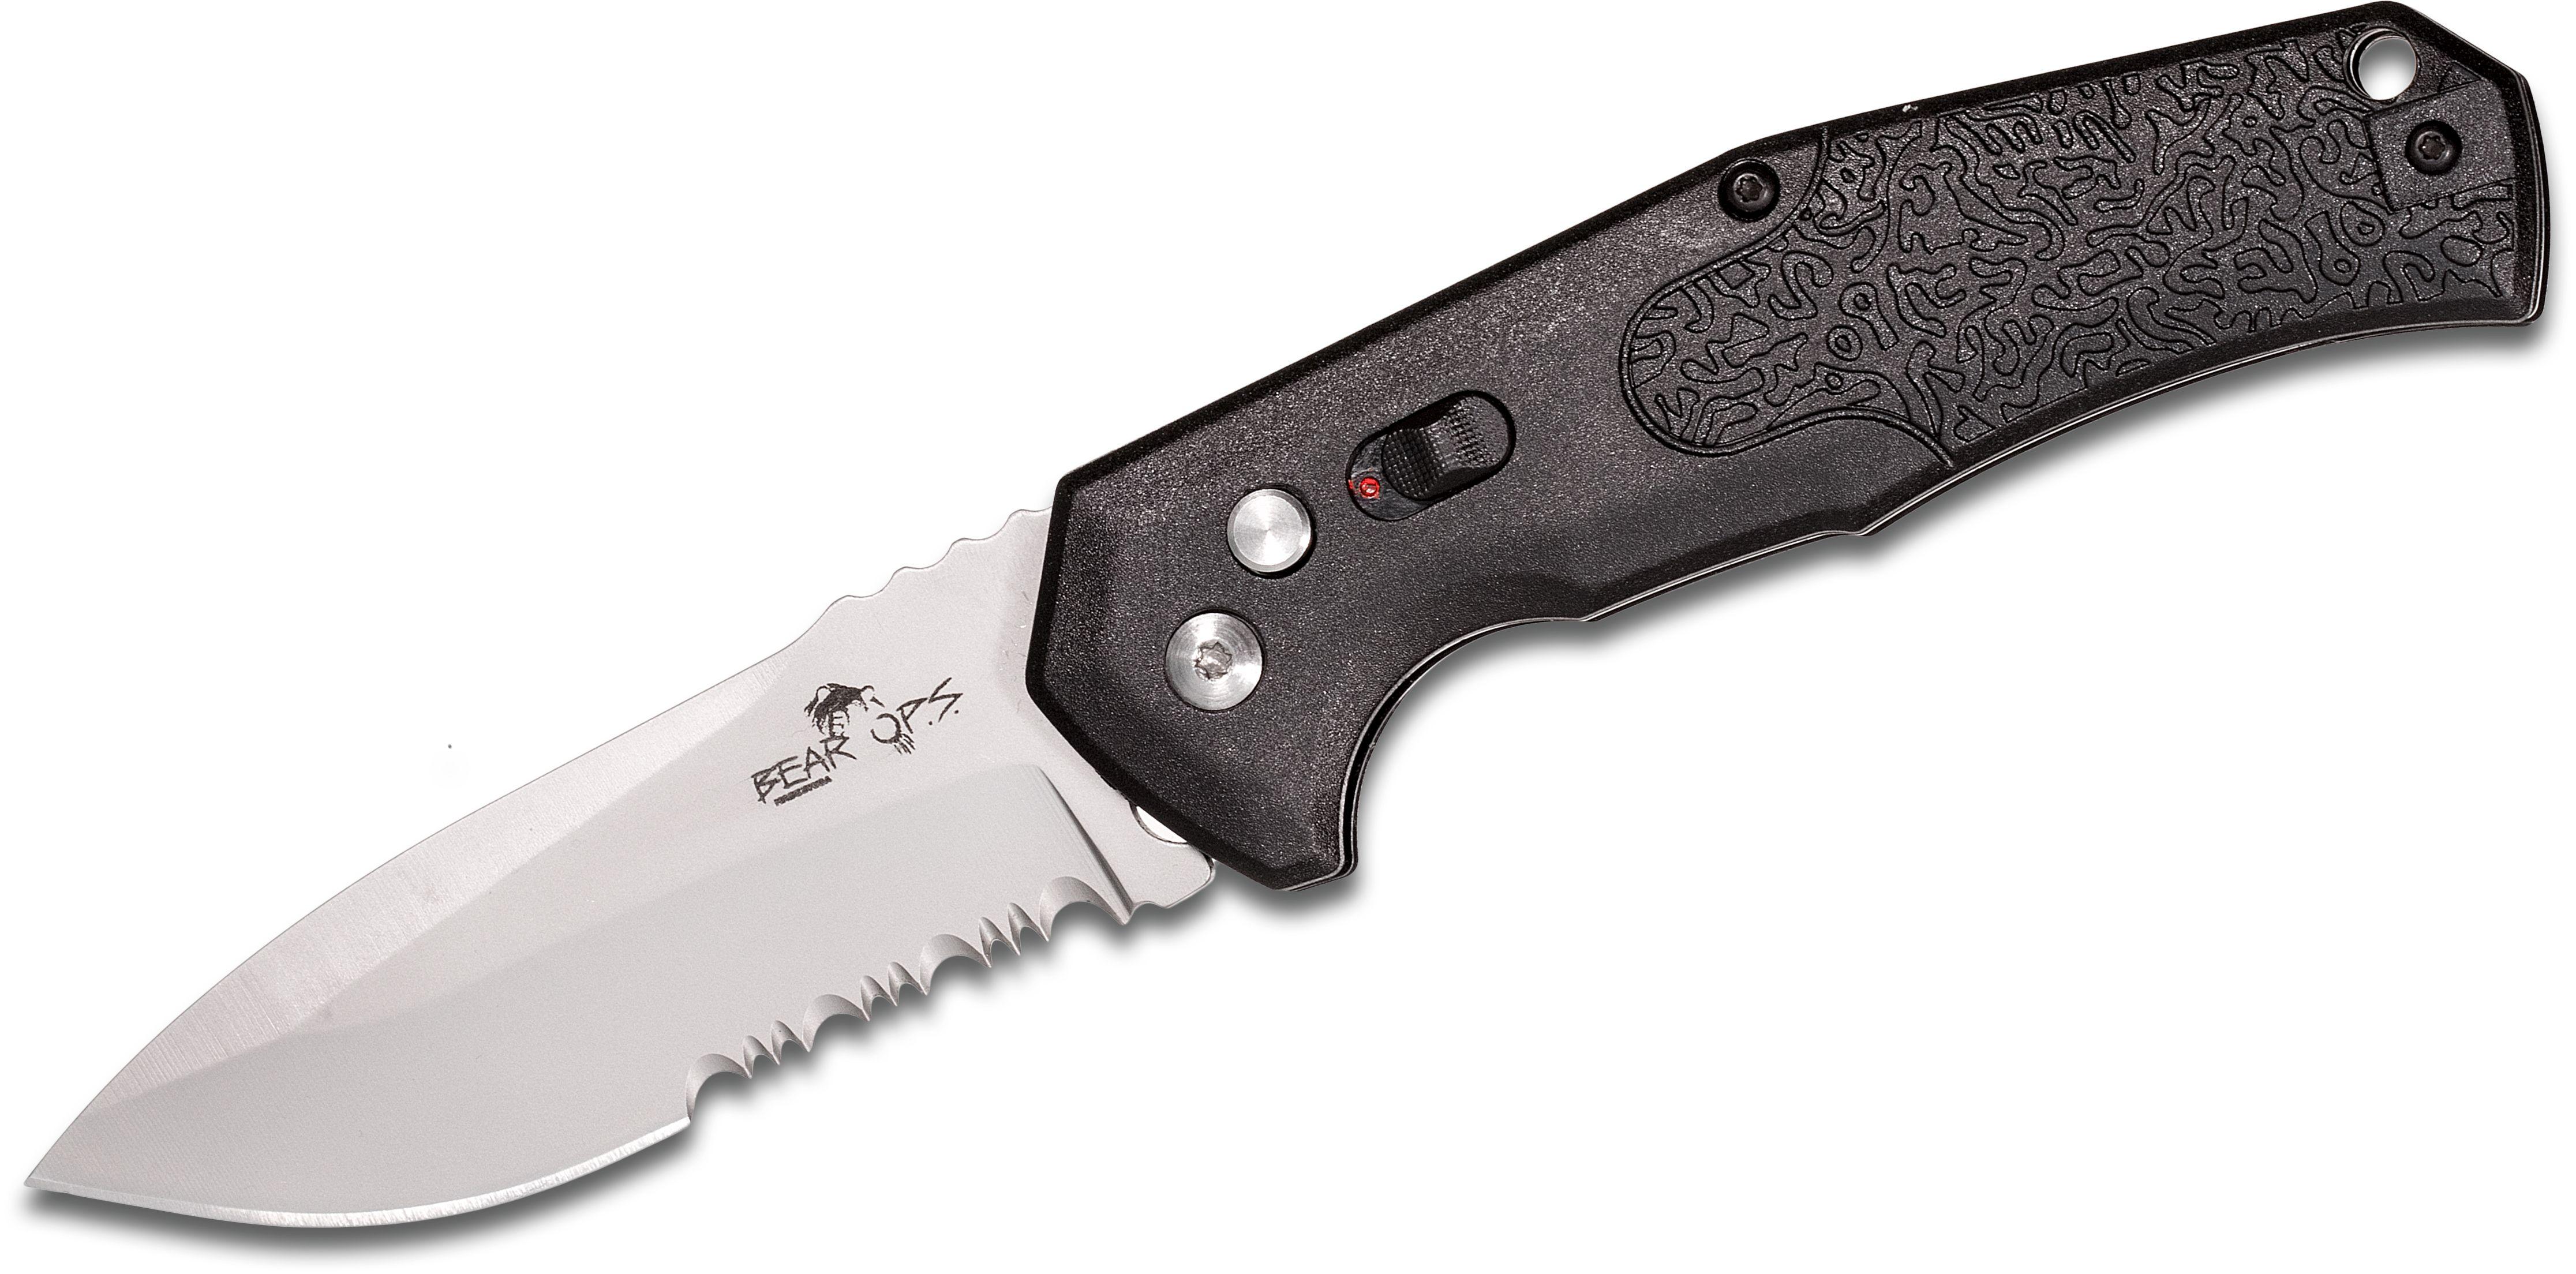 Bear OPS AC-600-B7-P Bold Action VI AUTO 3.125 inch 14C28N Bead Blasted Combo Blade, Black Zytel Handles